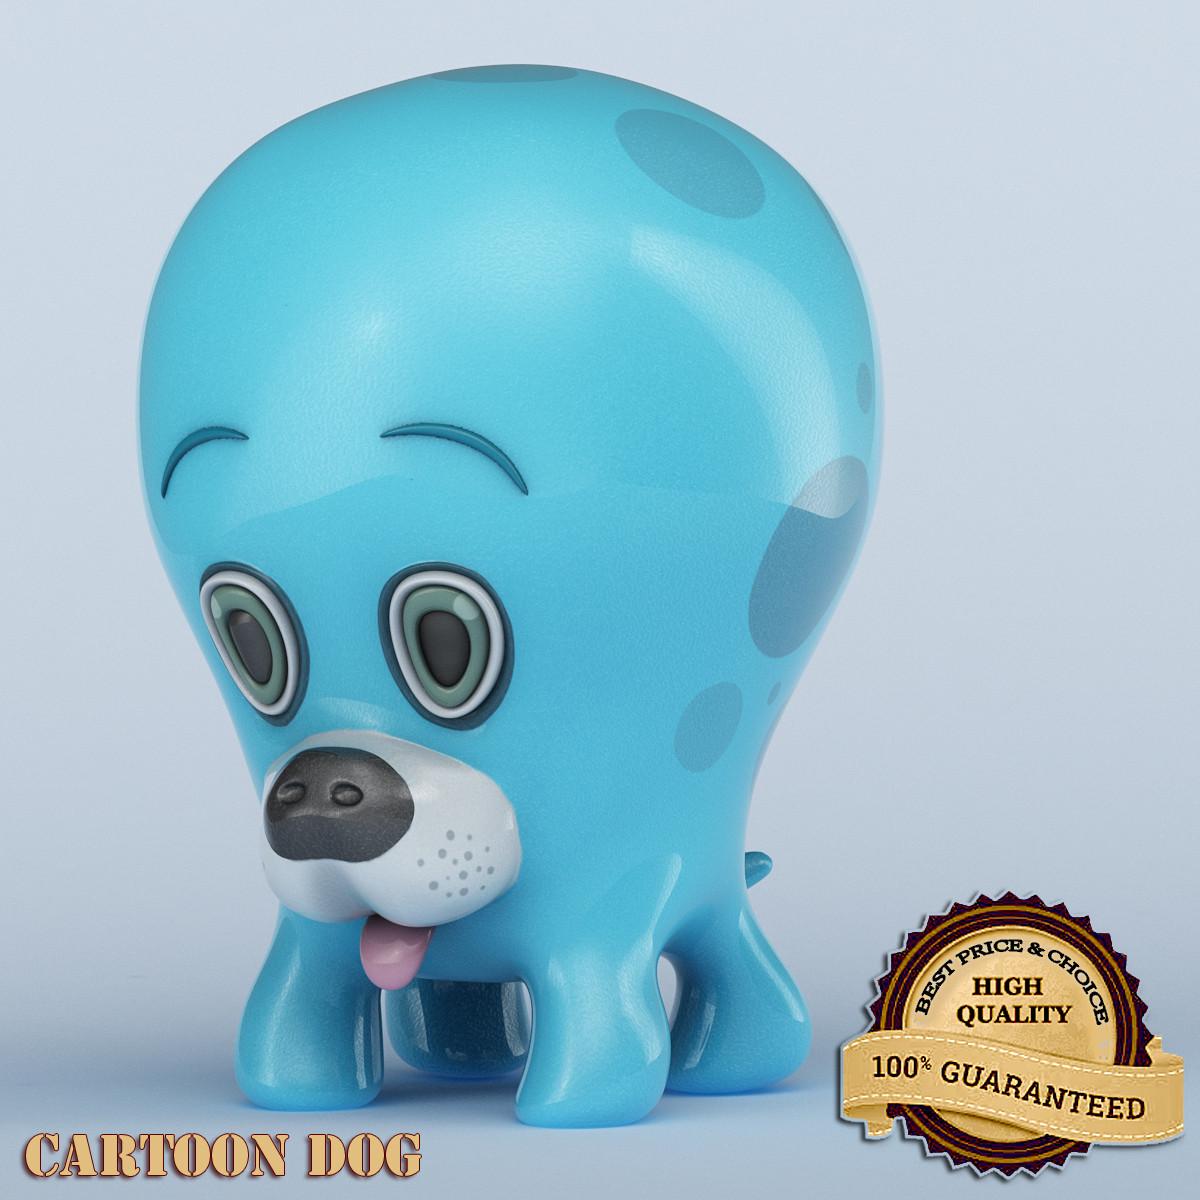 002_Cartoon Dog.jpg